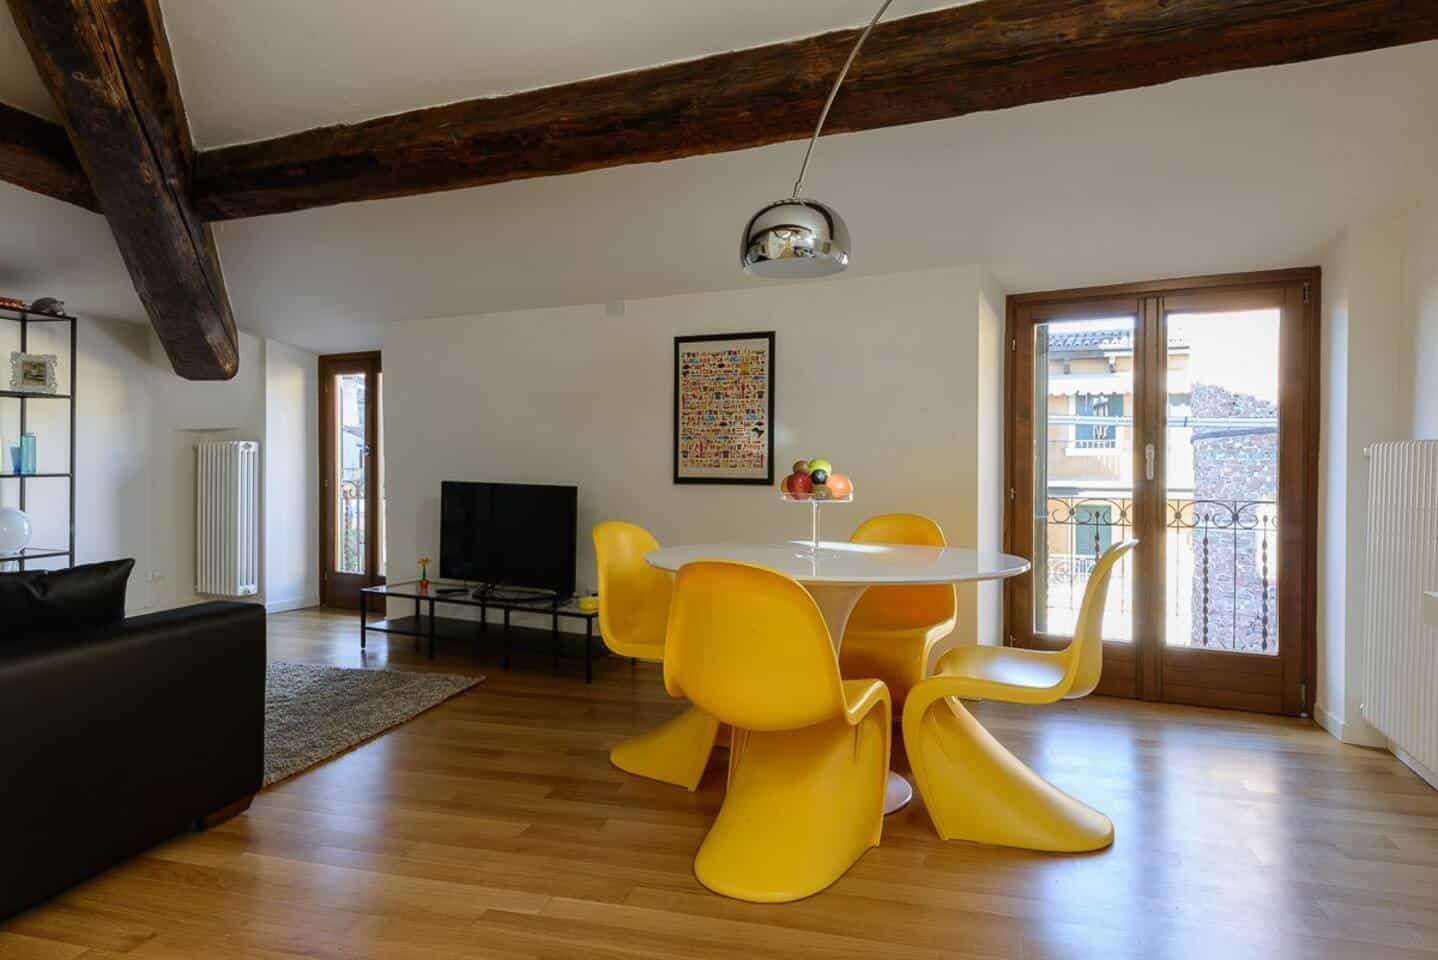 Image of Airbnb rental in Verona, Italy